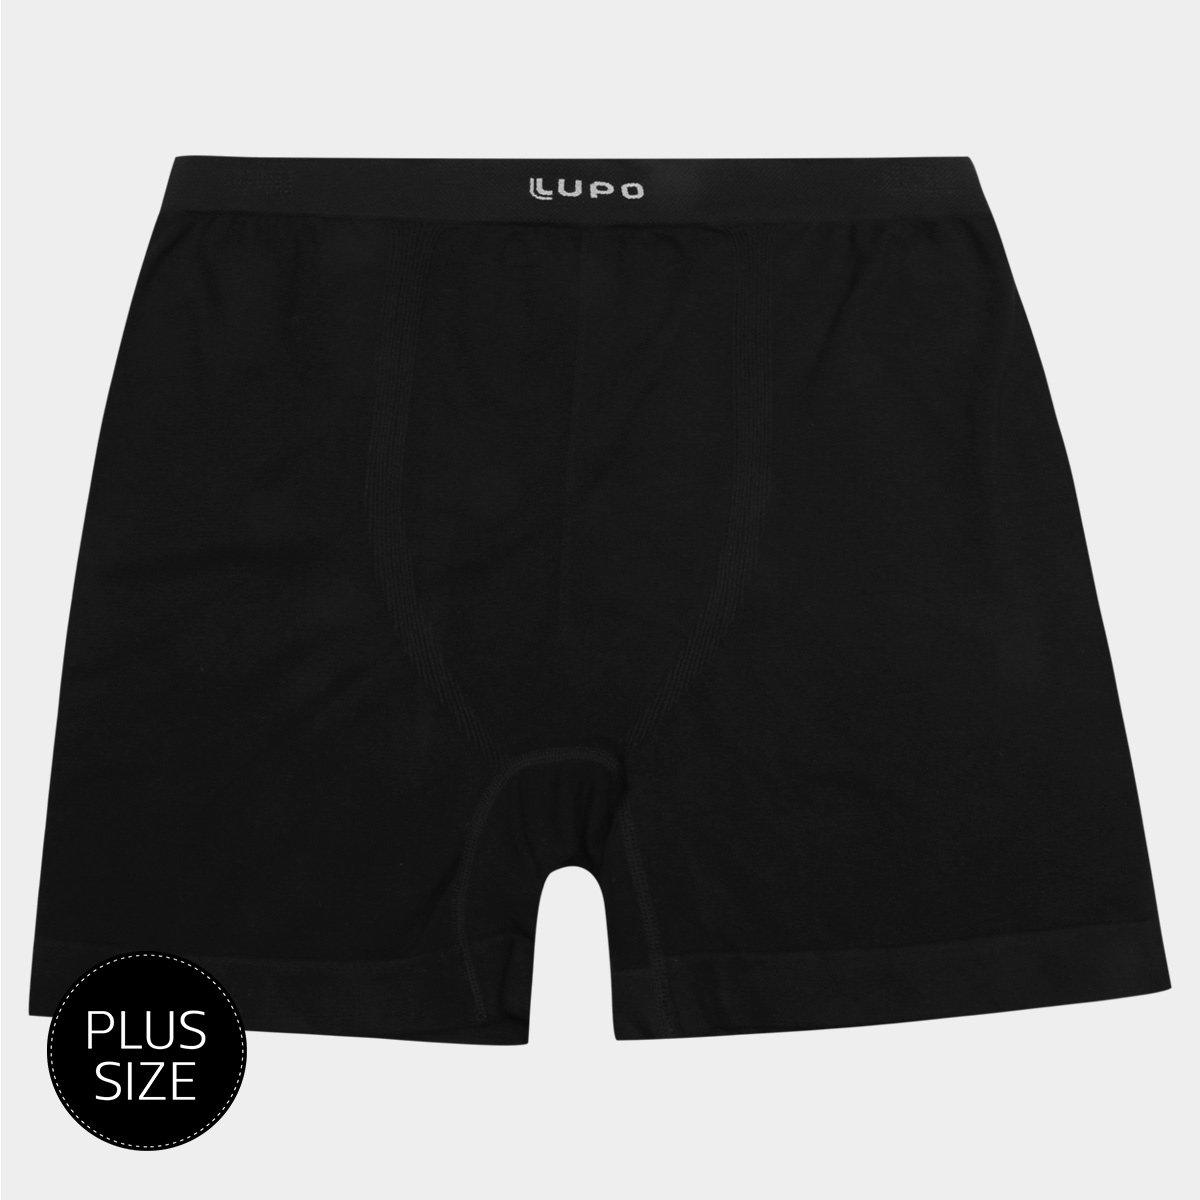 01520d065 Cueca Boxer Lupo Micromodal Plus Size - Preto